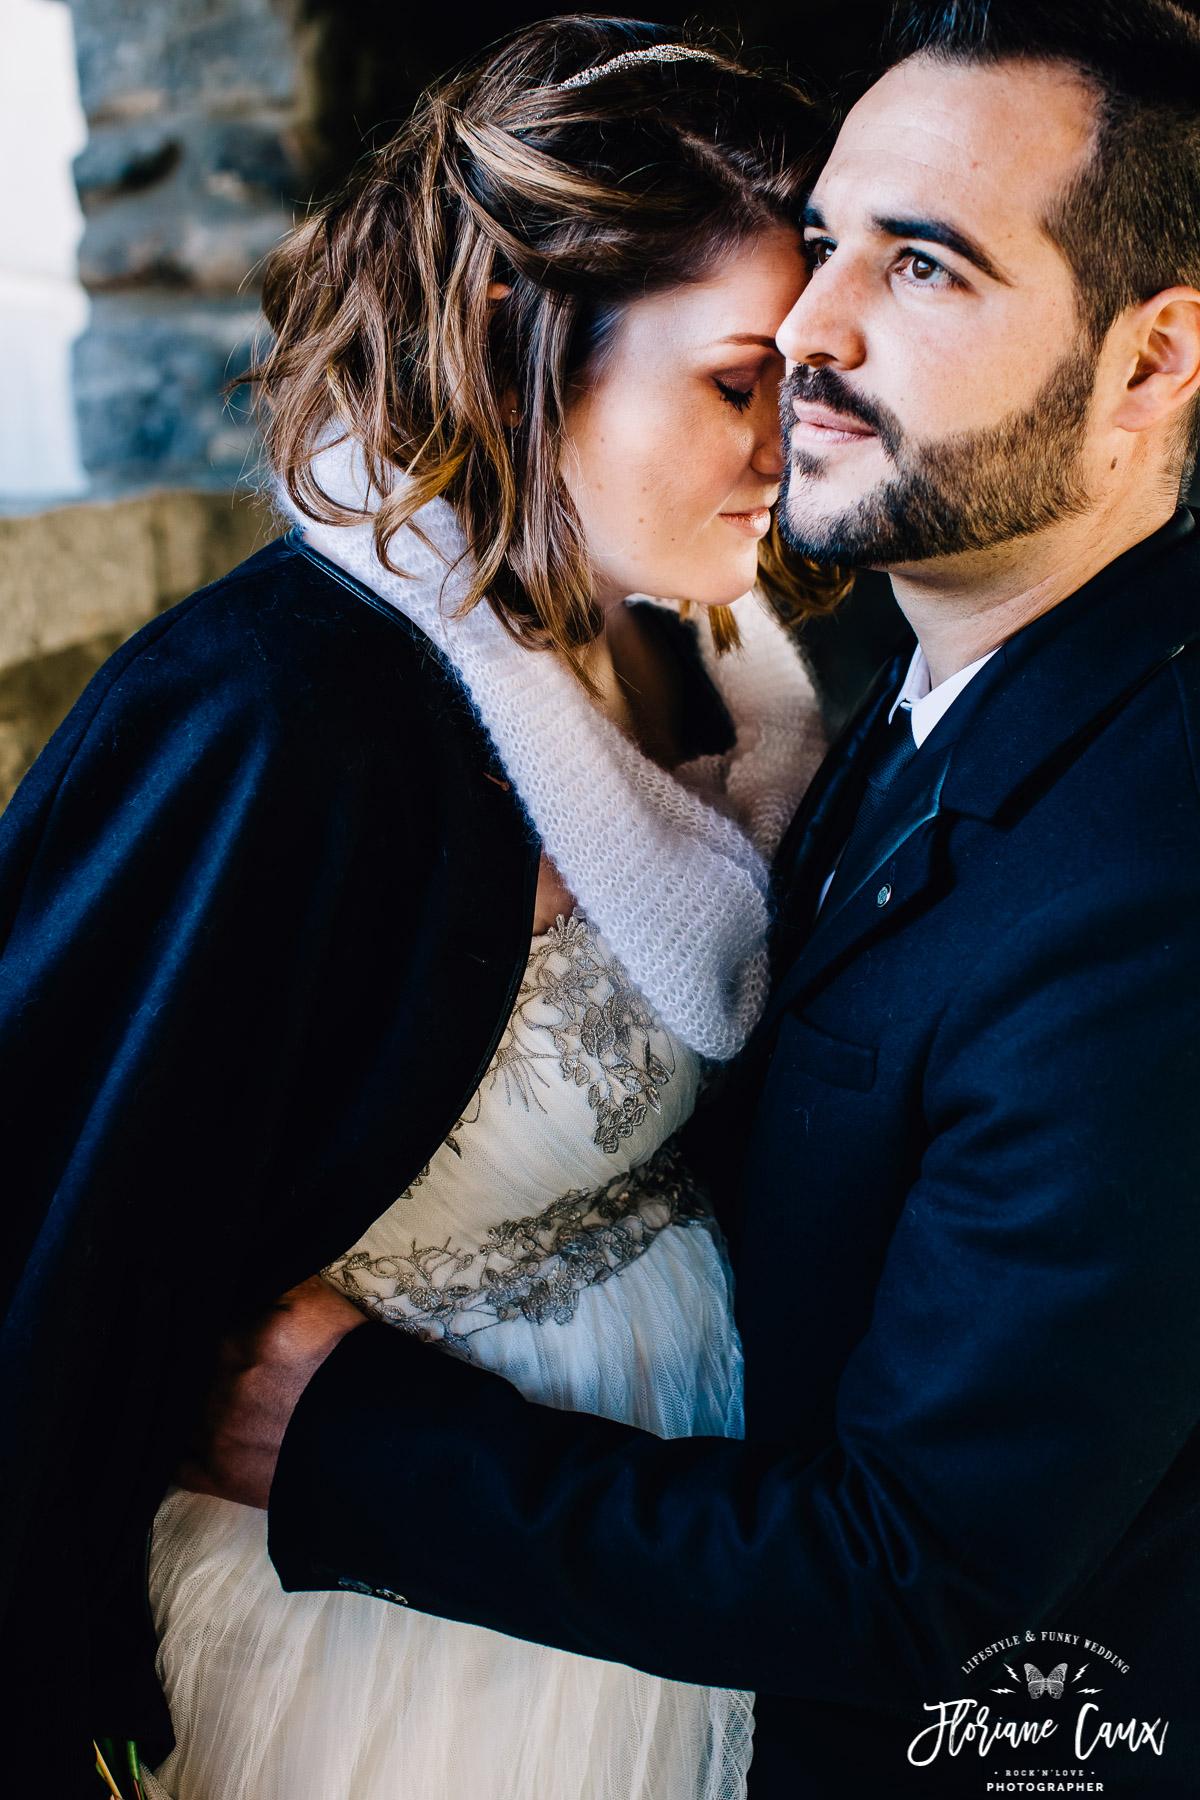 photo de couple mariée enceinte de 5 mois